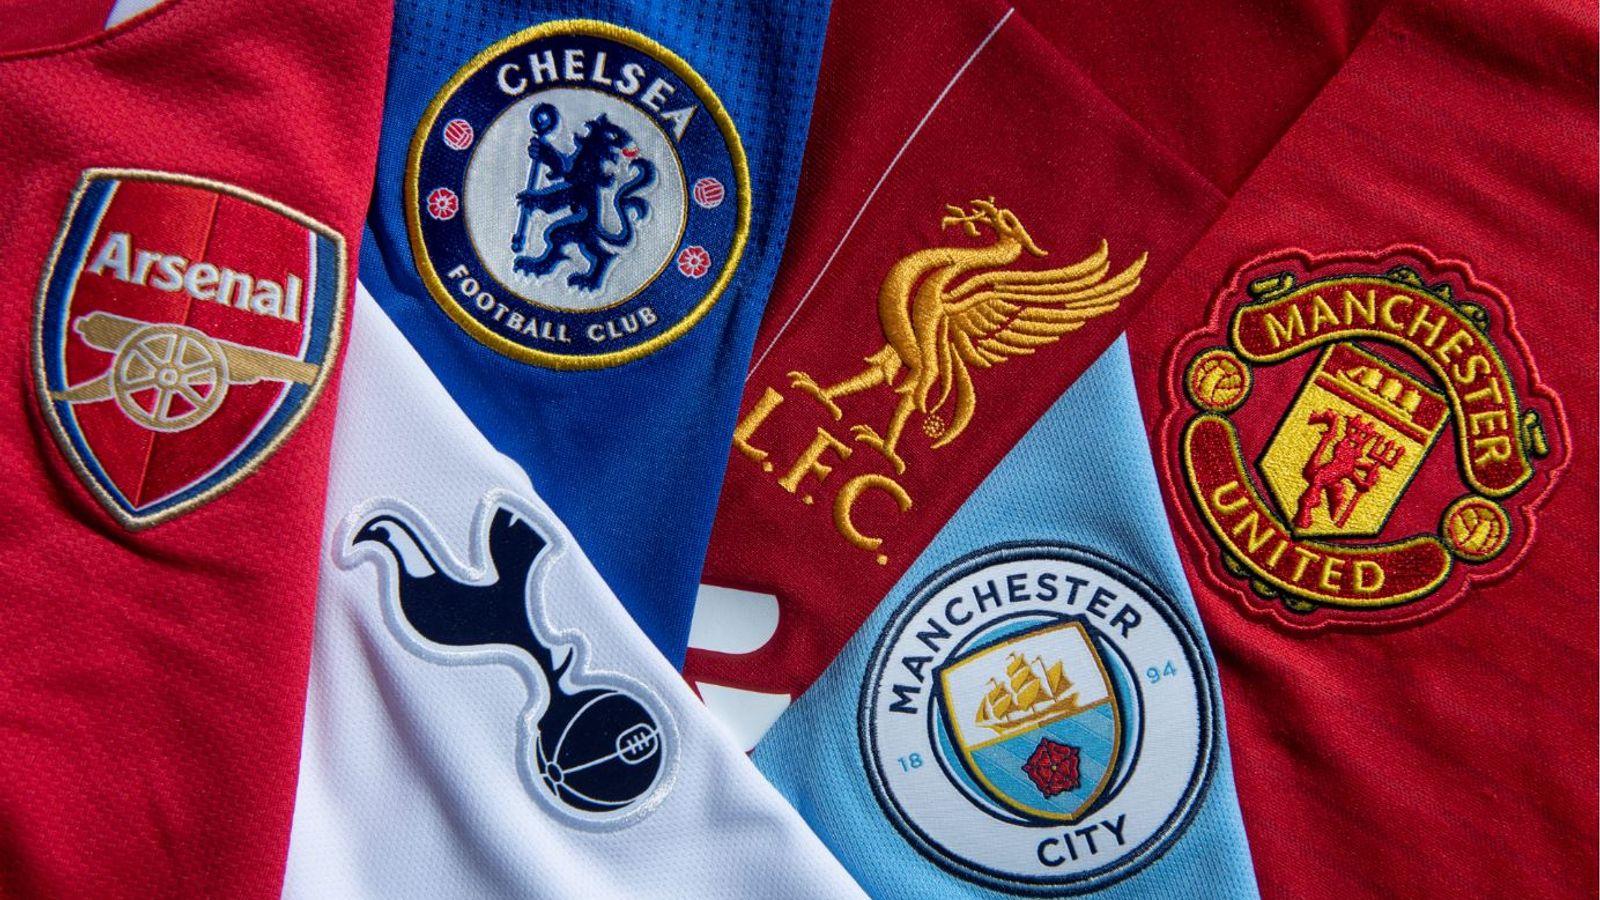 European Super League: Man Utd, Liverpool, Chelsea, Arsenal, Man City, and Tottenham join; Premier League clubs set to meet